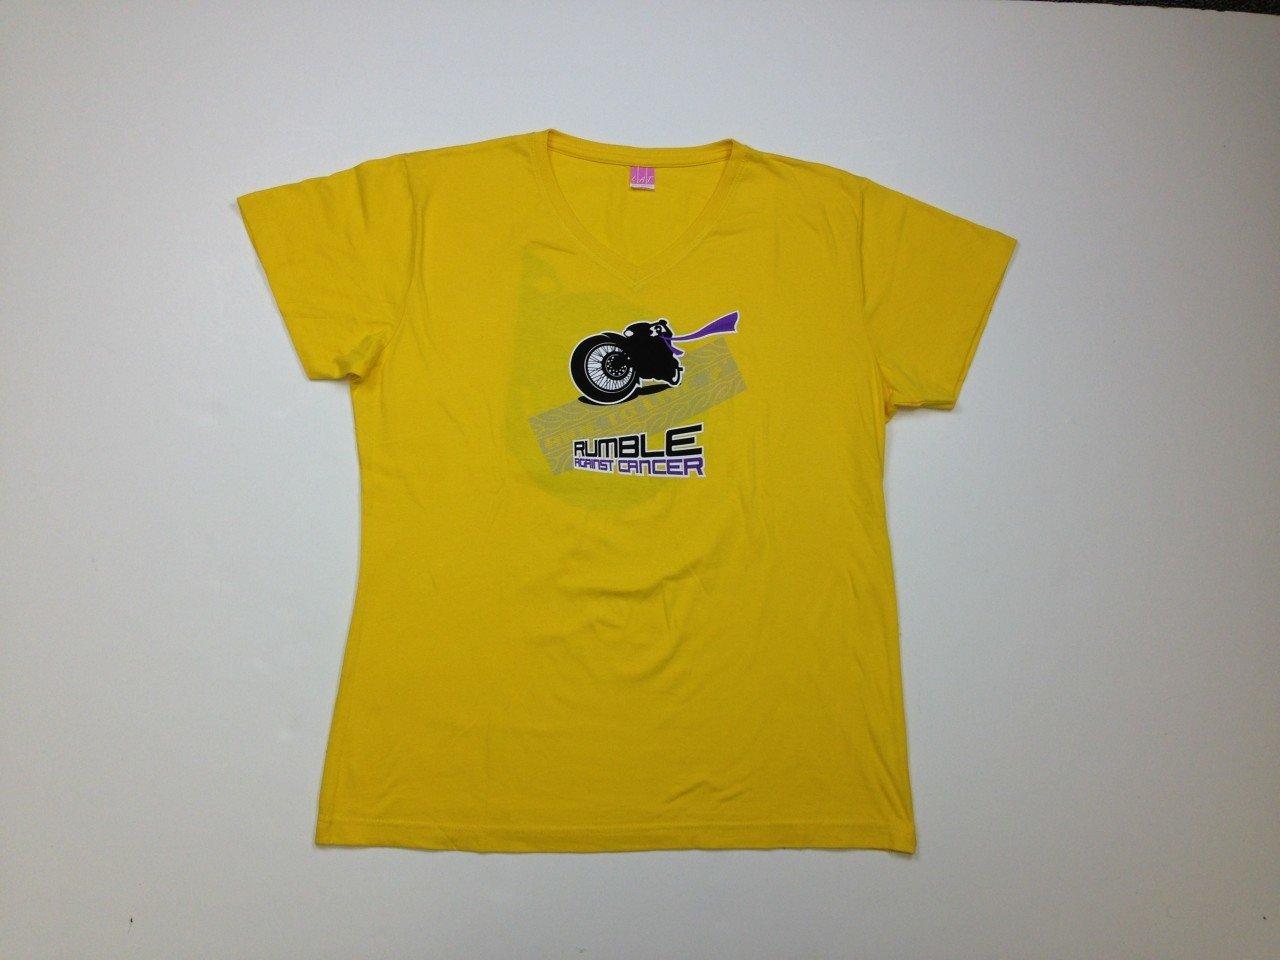 Yeller Rumble Shirt